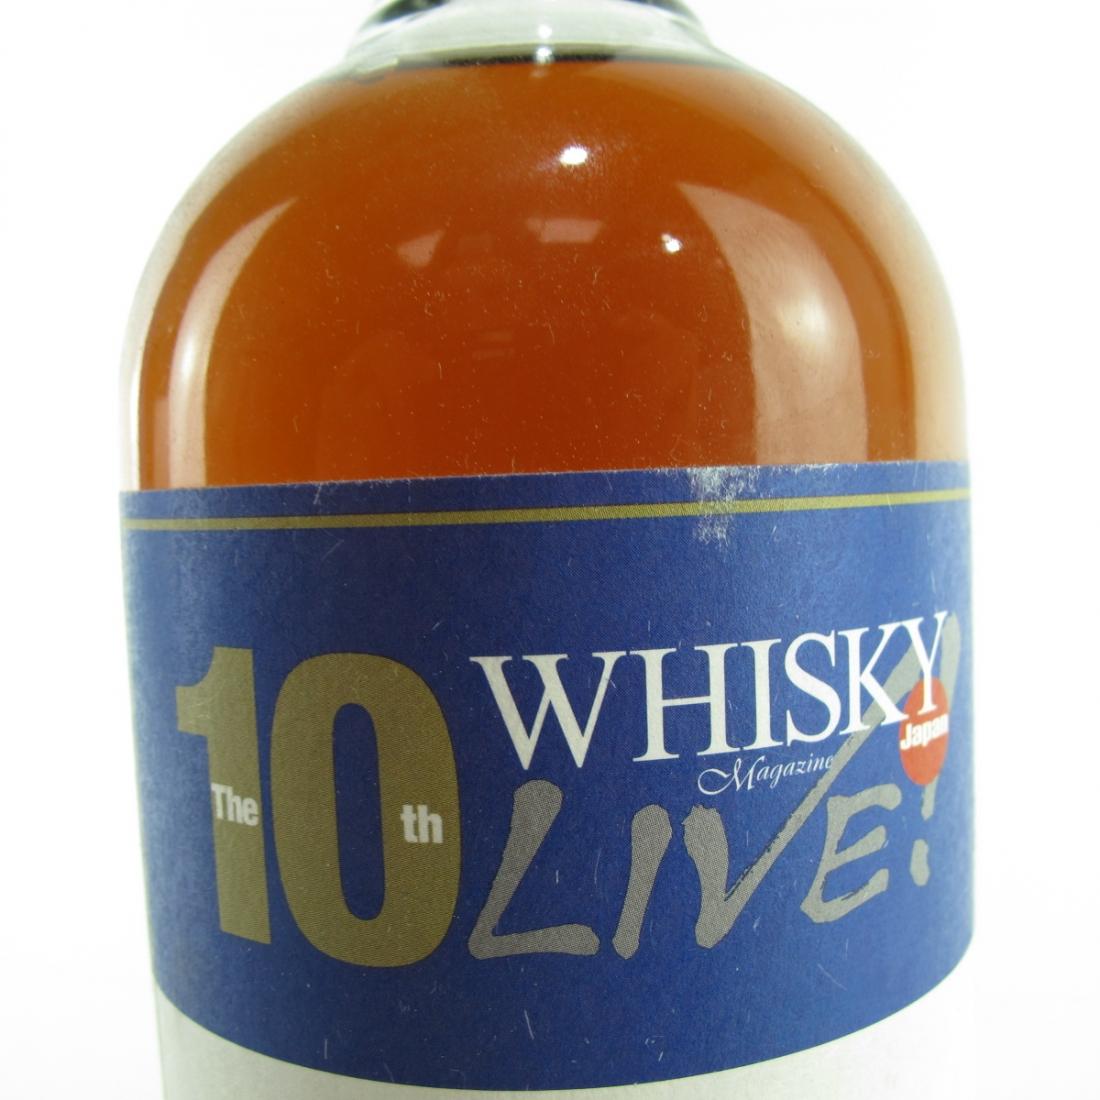 Hanyu 1991 Whisky Live 10th Anniversary 18 Year Old